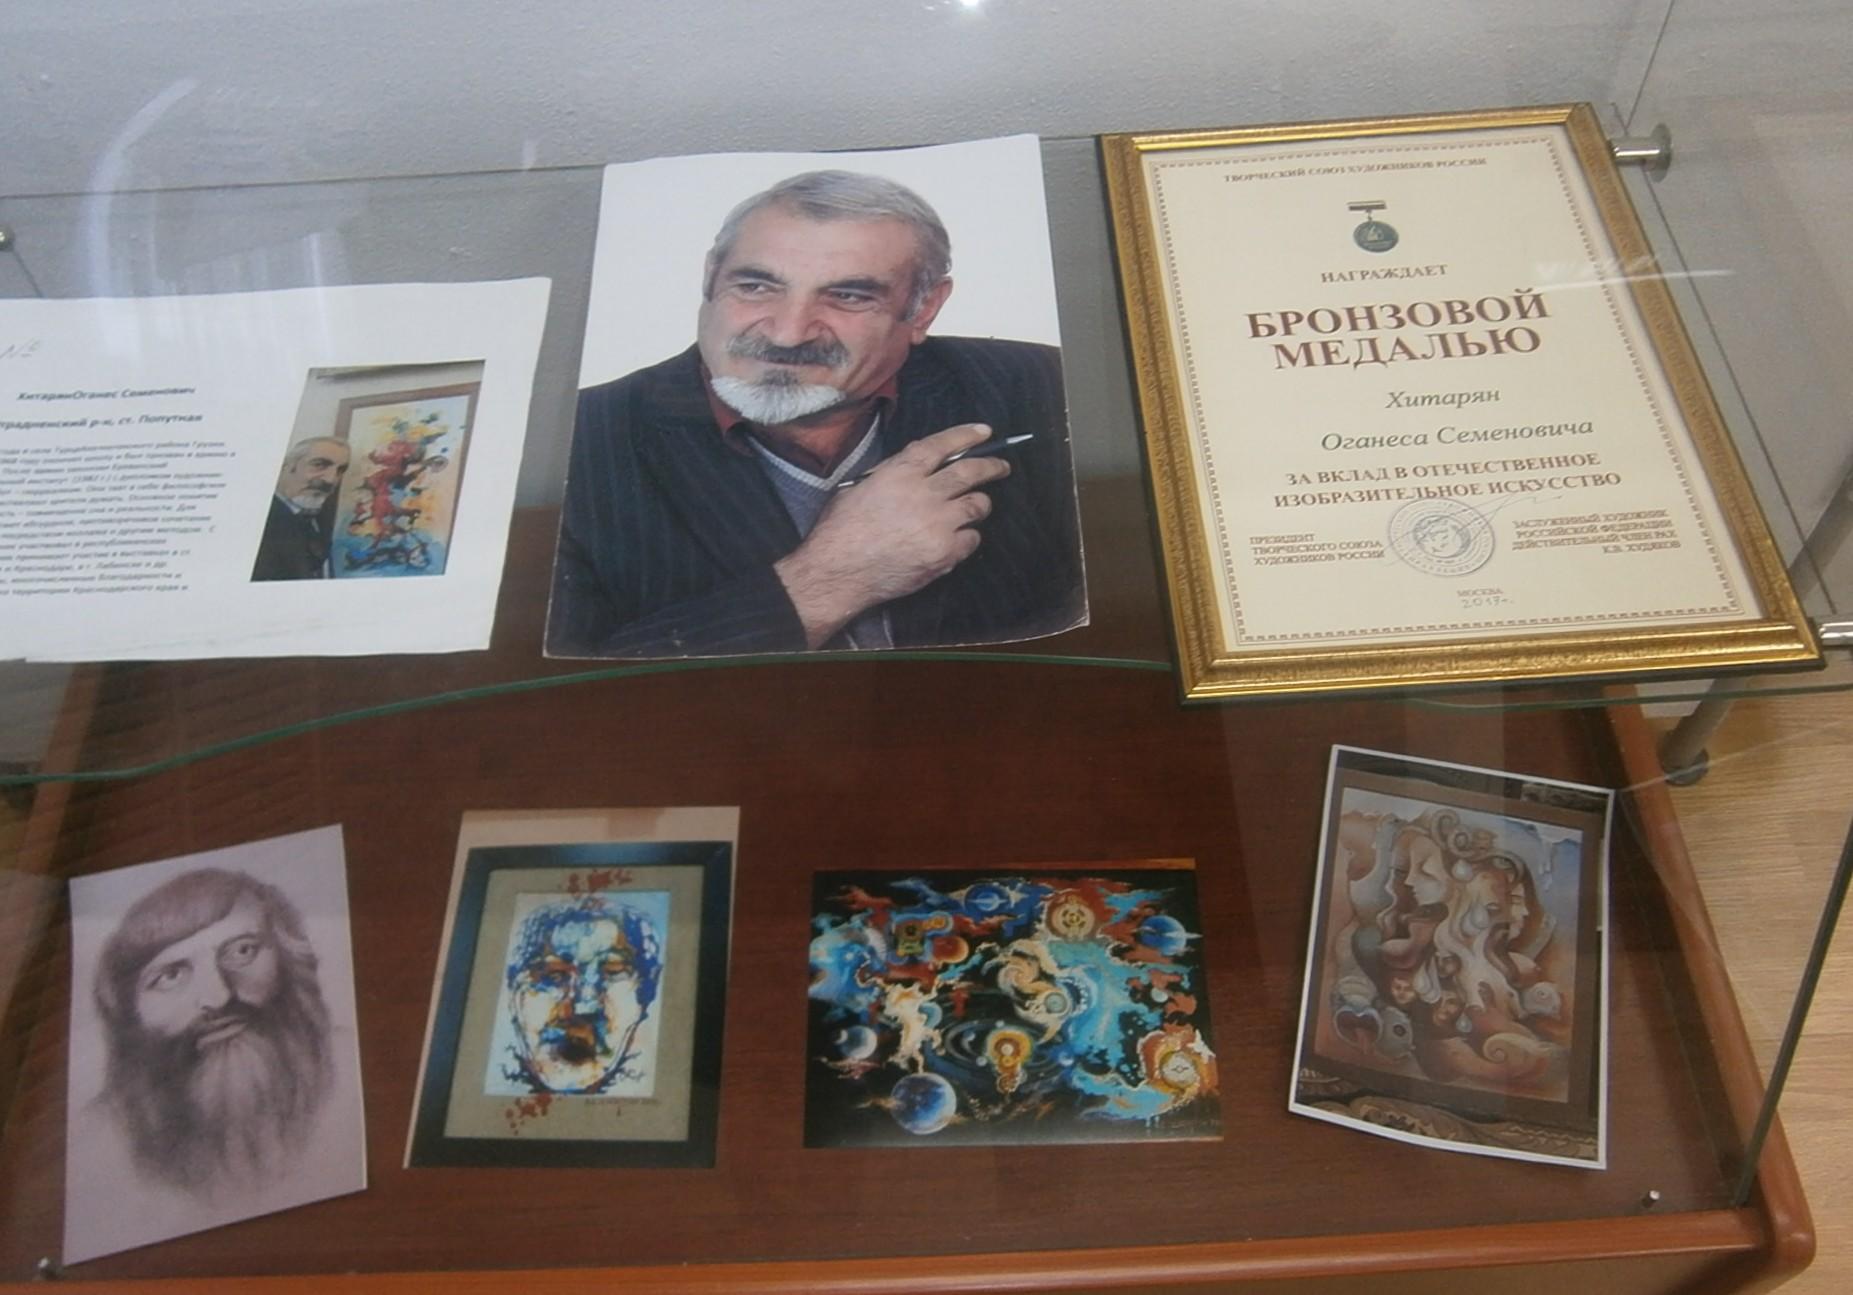 Фрагмент экспозиции | nevworker.ru